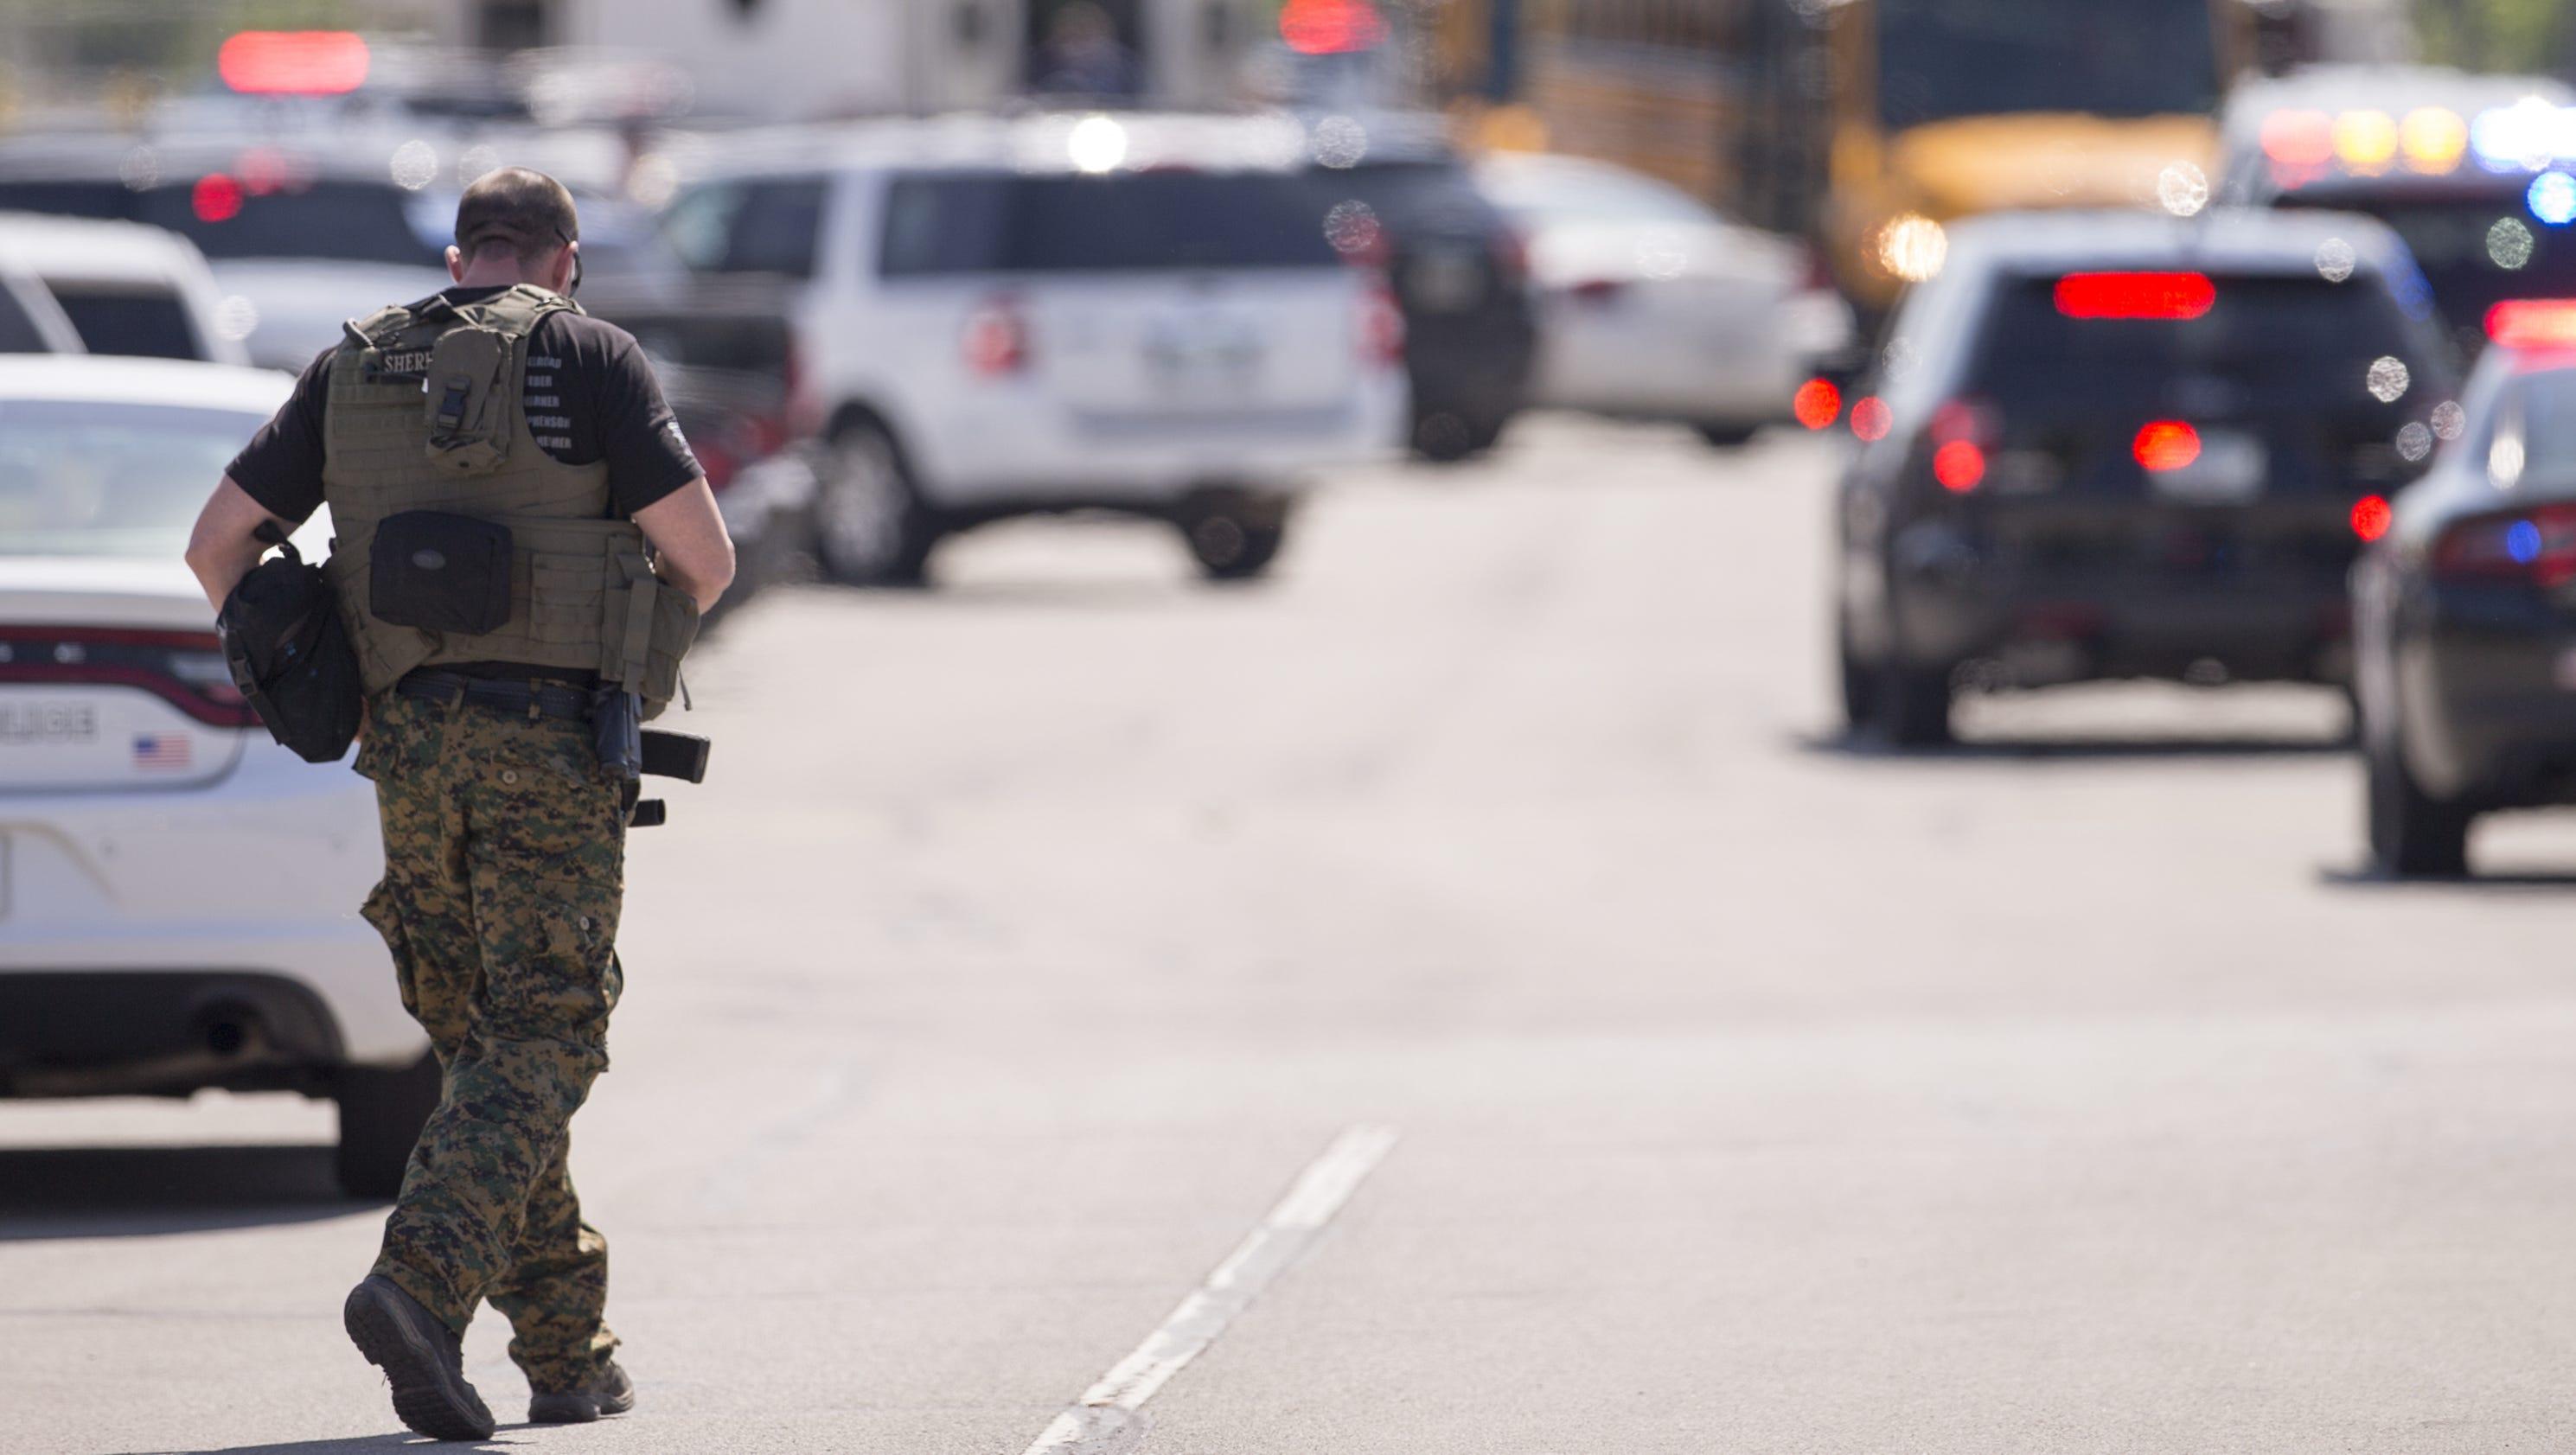 Noblesville shooting latest updates: Injured teacher identified, student detained